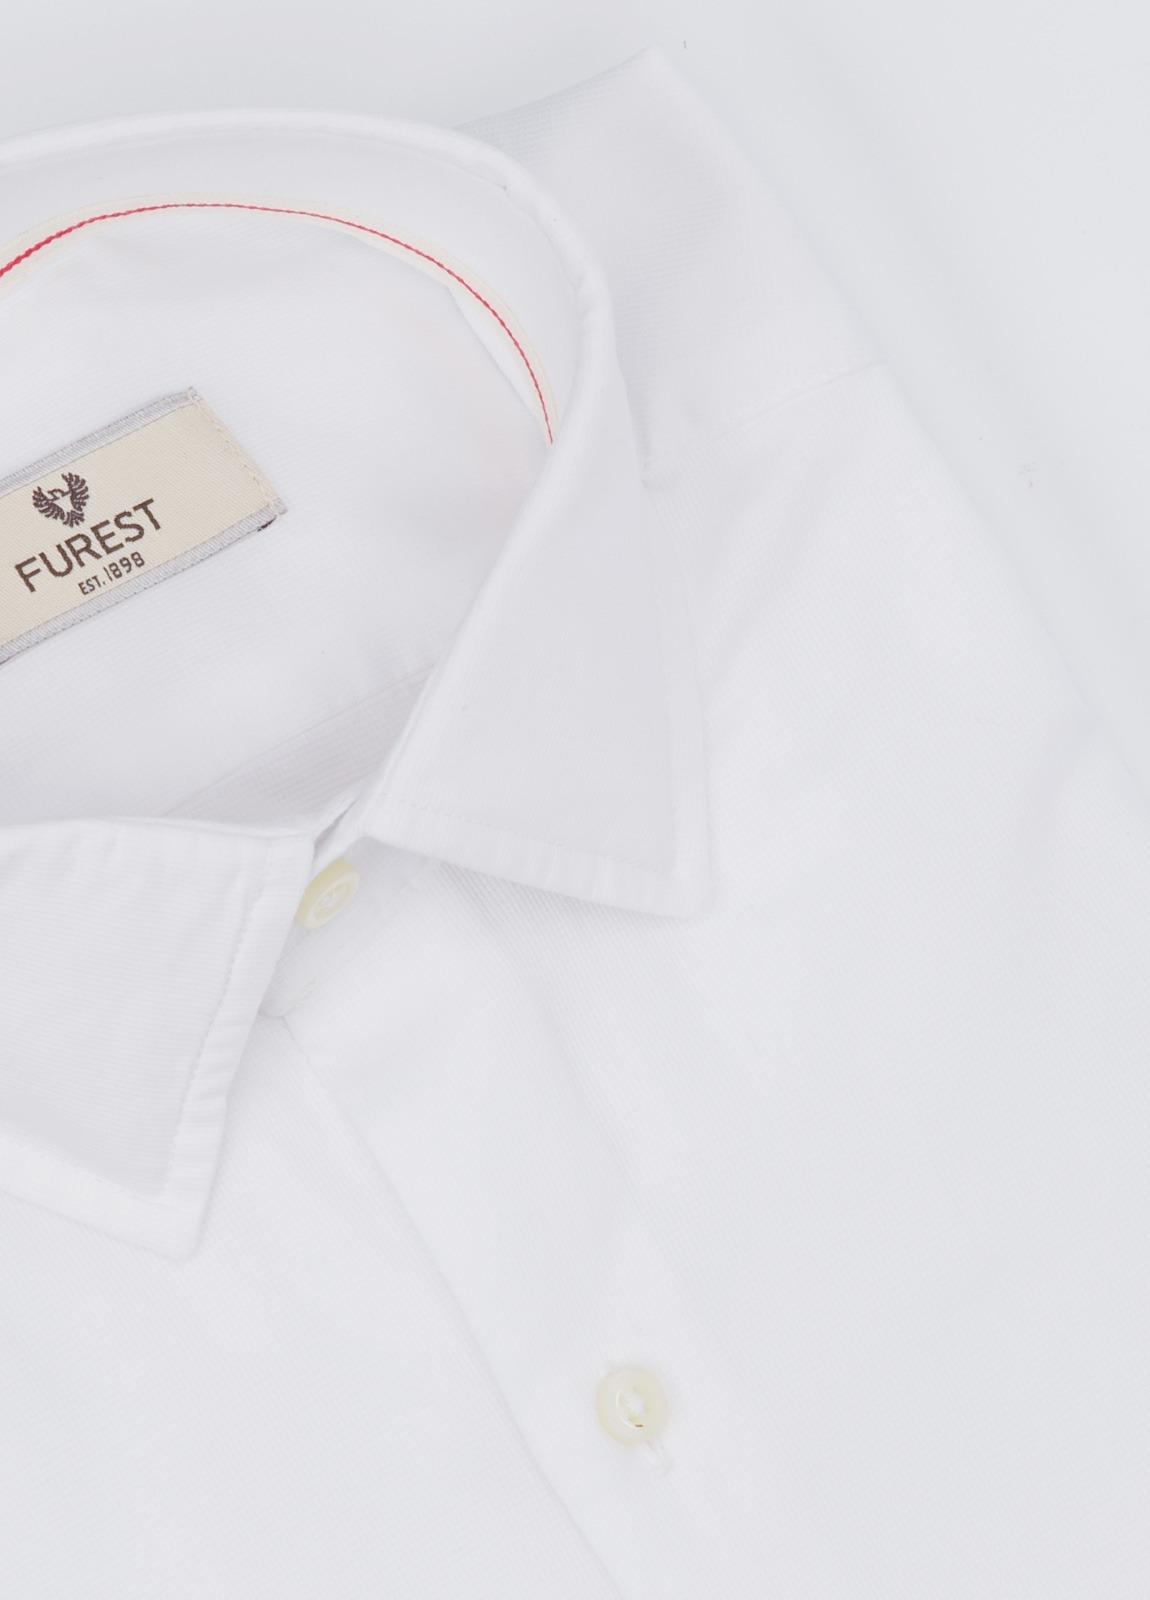 Camisa Leisure Wear SLIM FIT modelo PORTO, color blanco. 100% Algodón. - Ítem1